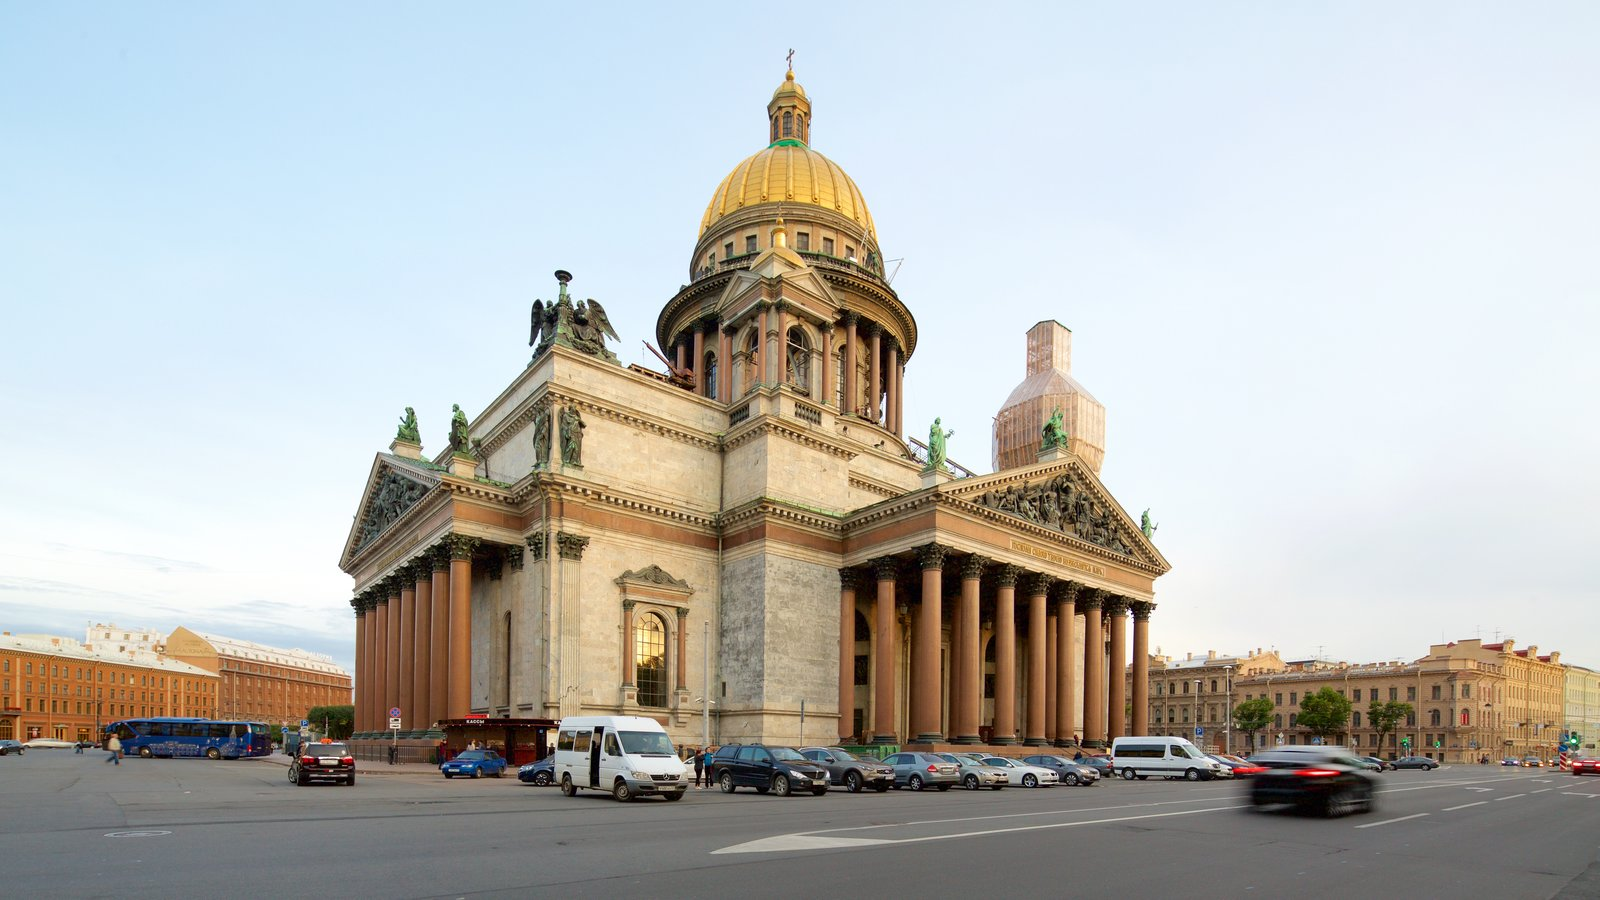 Catedral de S. Isaac caracterizando arquitetura de patrimônio